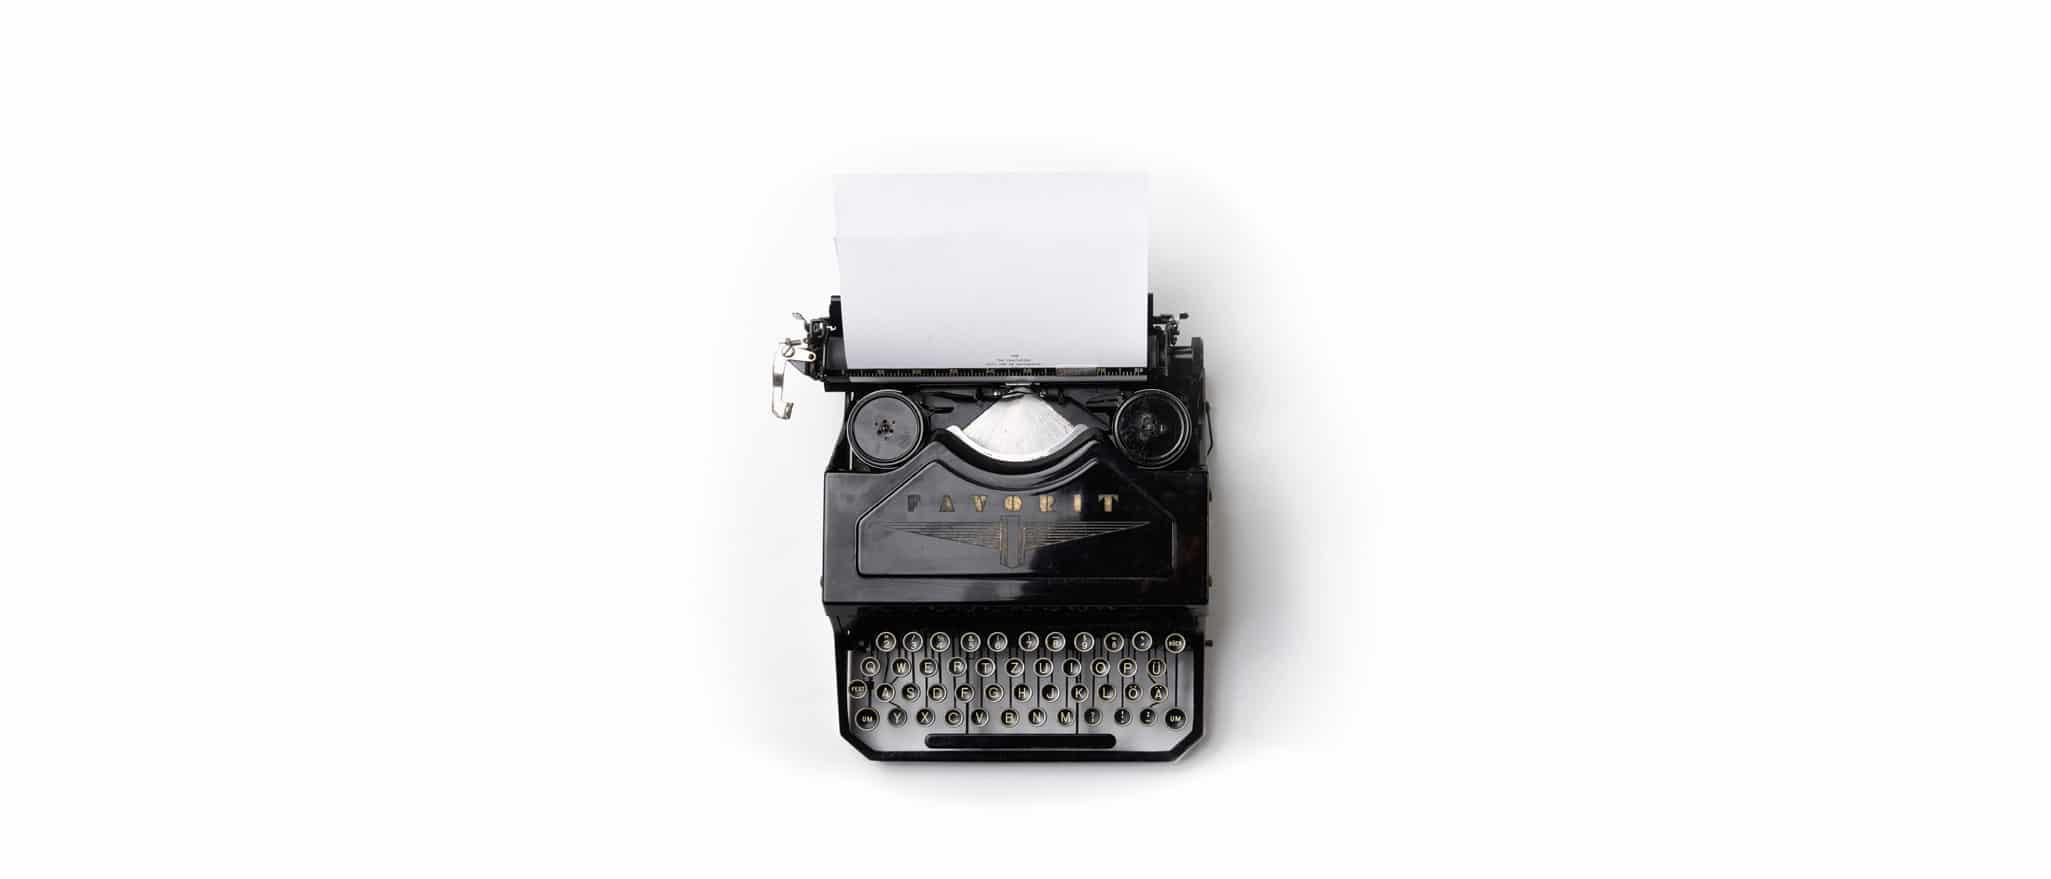 agencia de viajes cabo verde documentación legal máquina de escribir